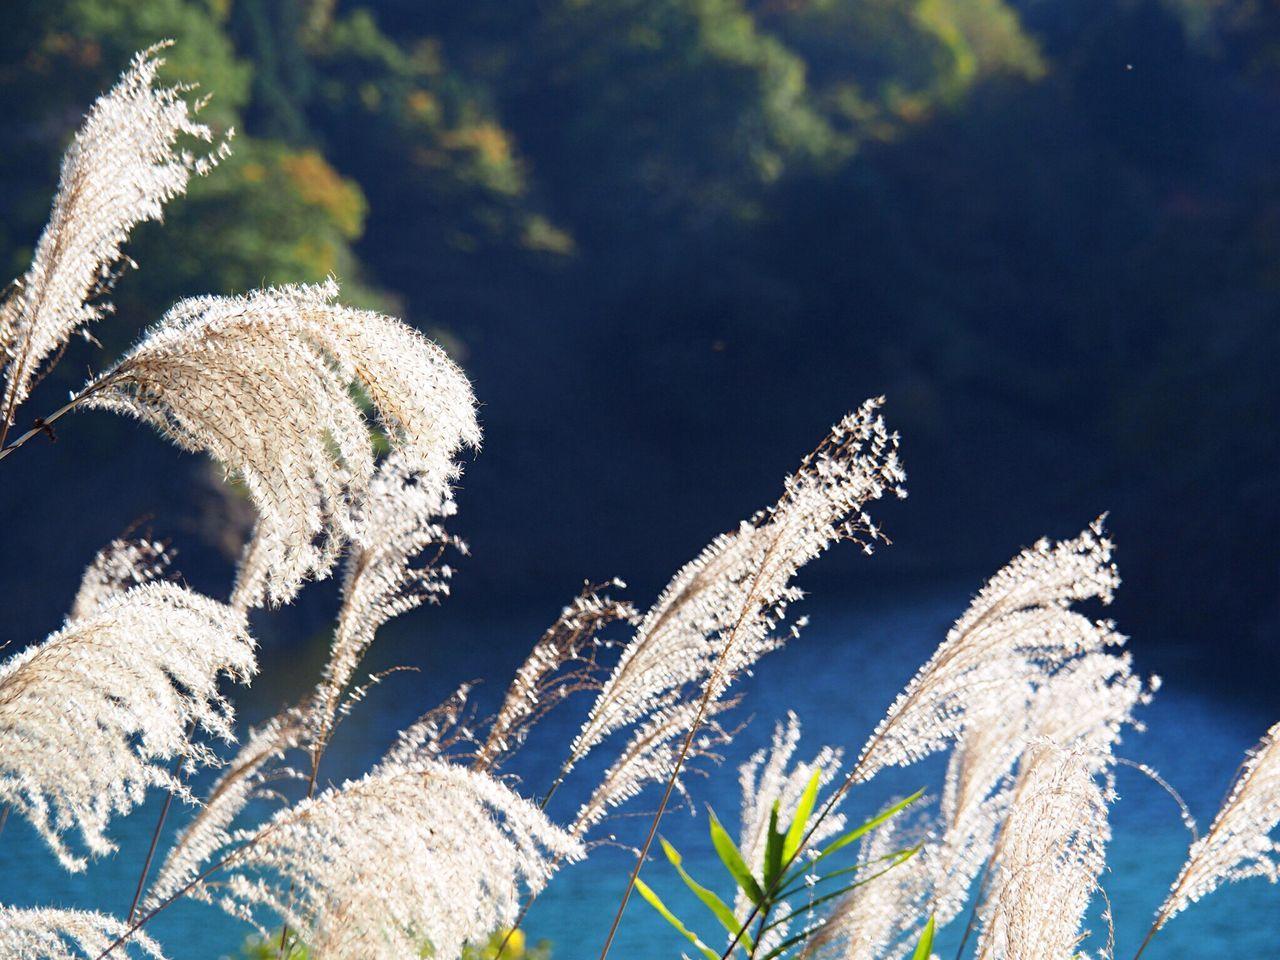 Close-Up Of Tall Grass Outdoors